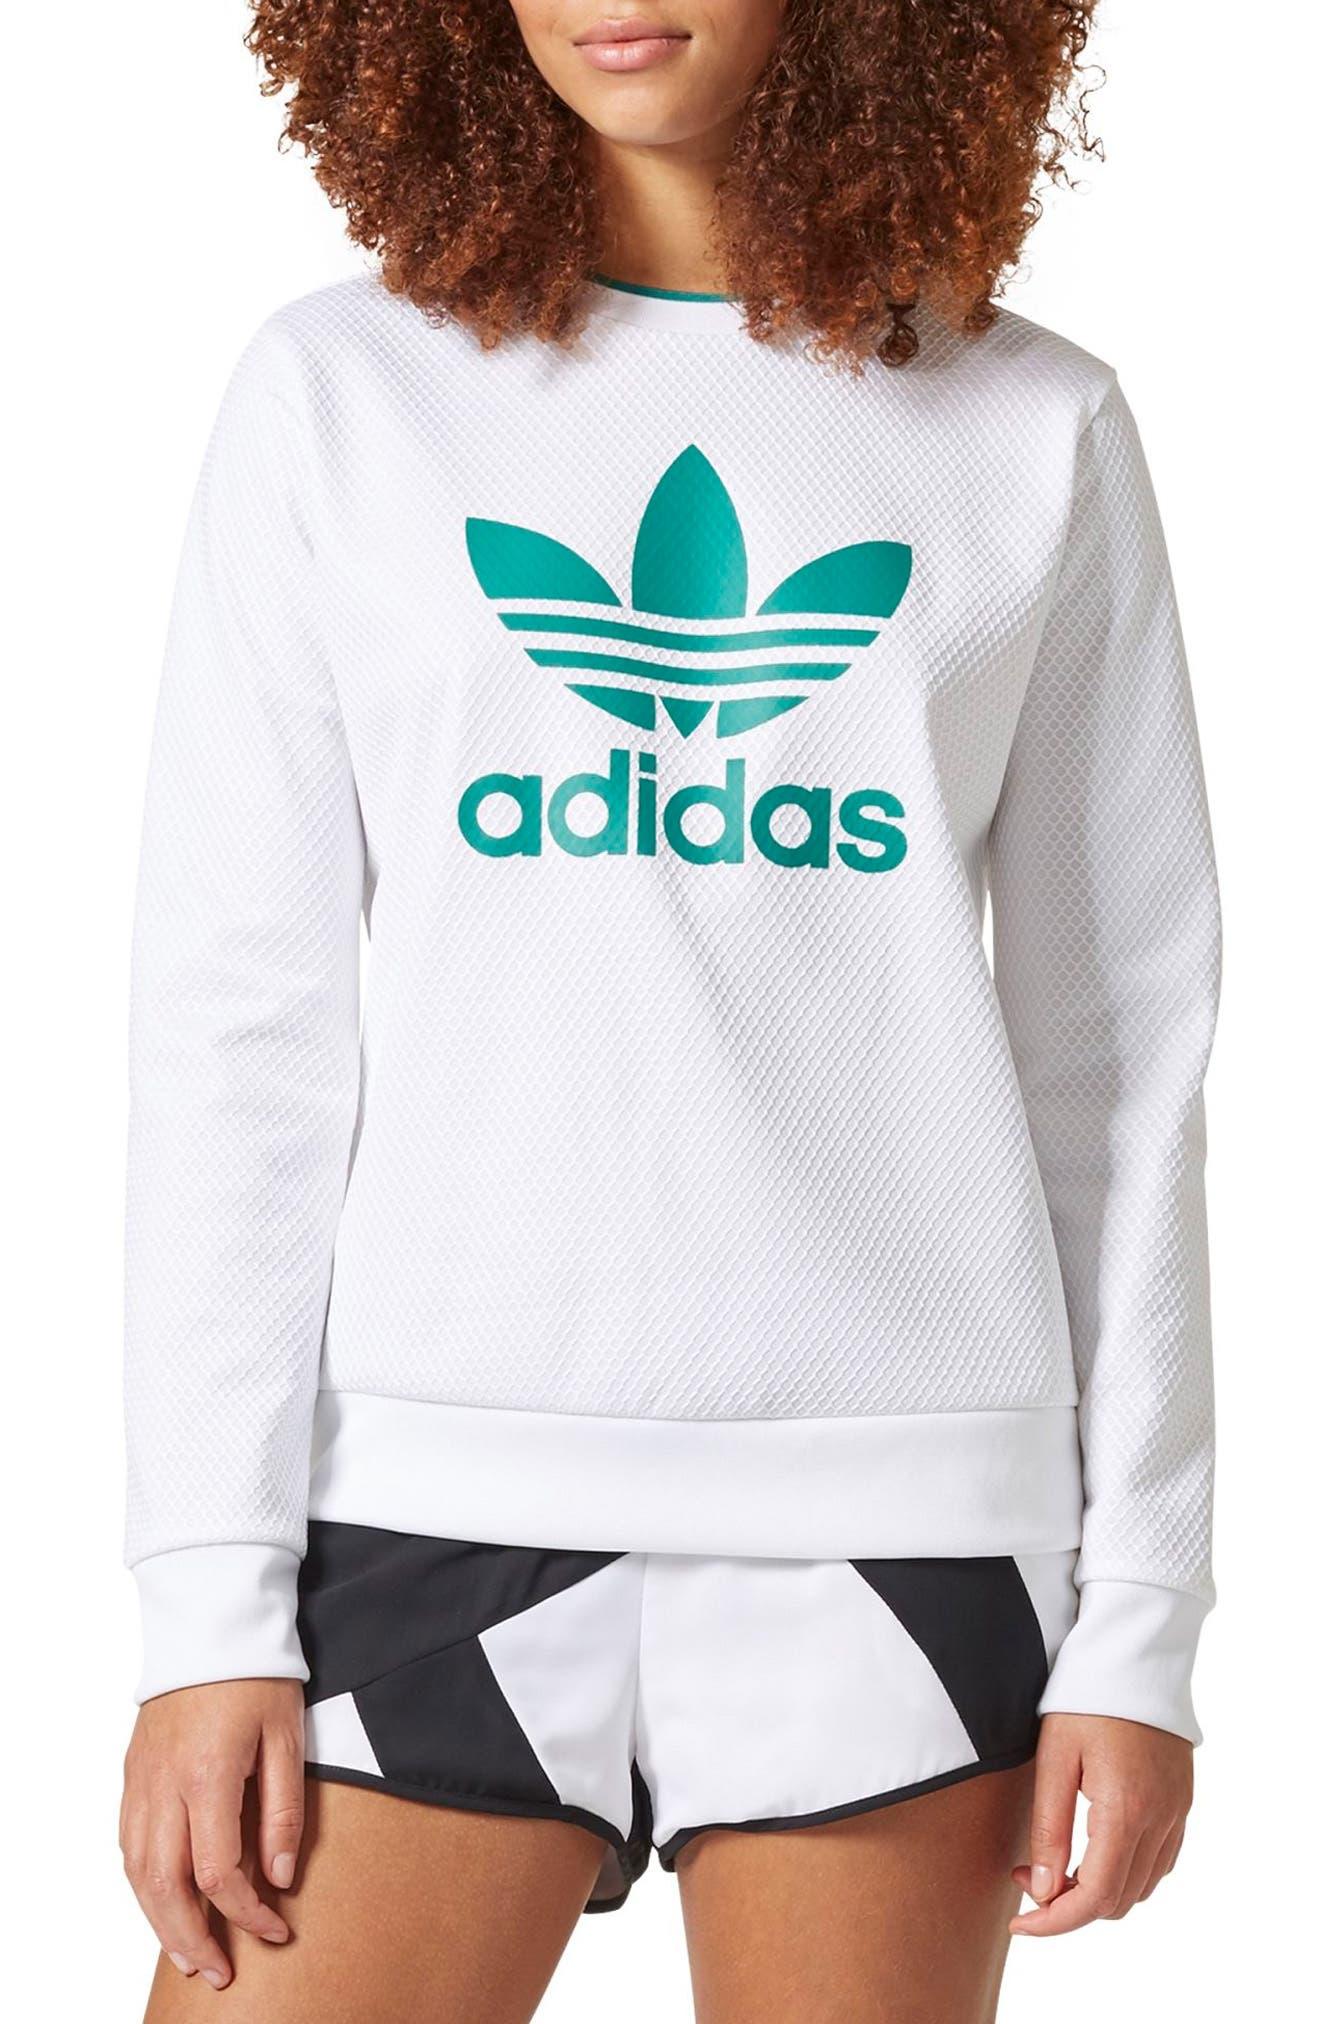 adidas Originals EQT Trefoil Pullover